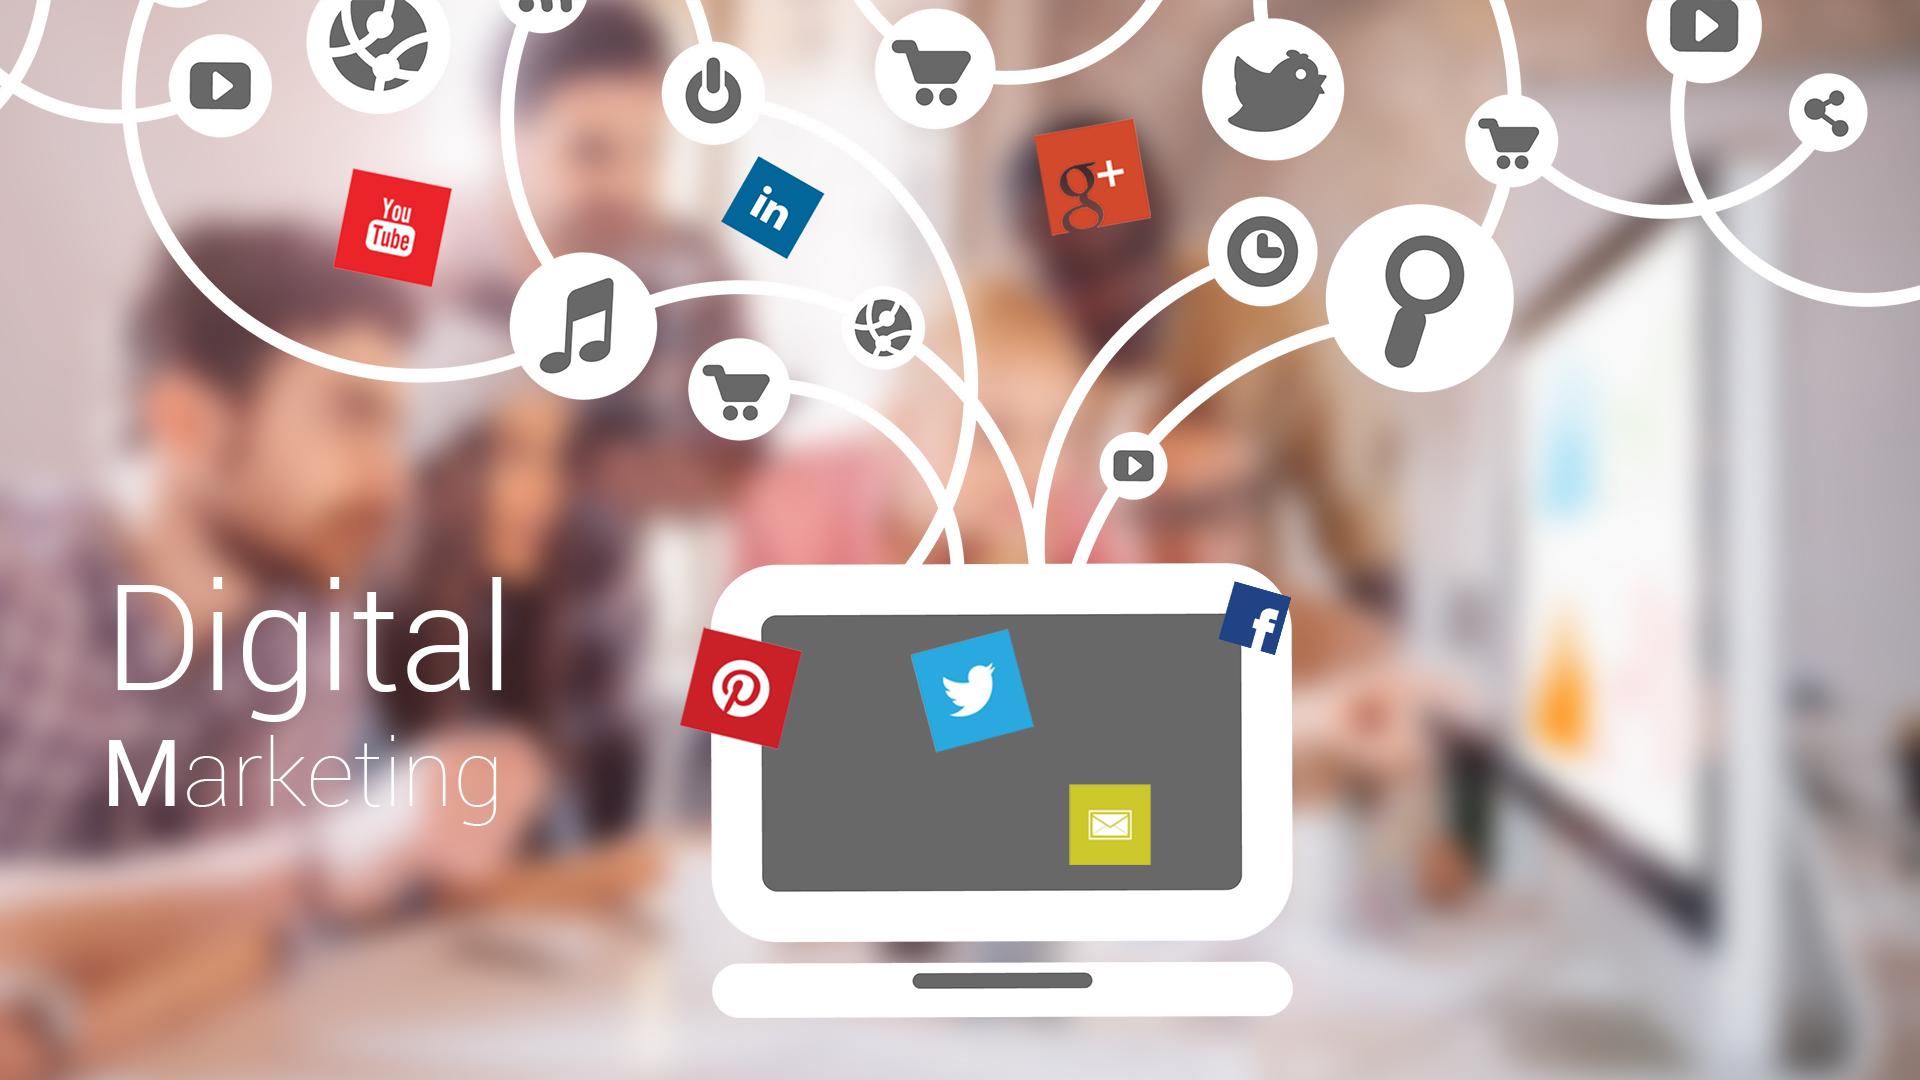 онлайн-маркетинга